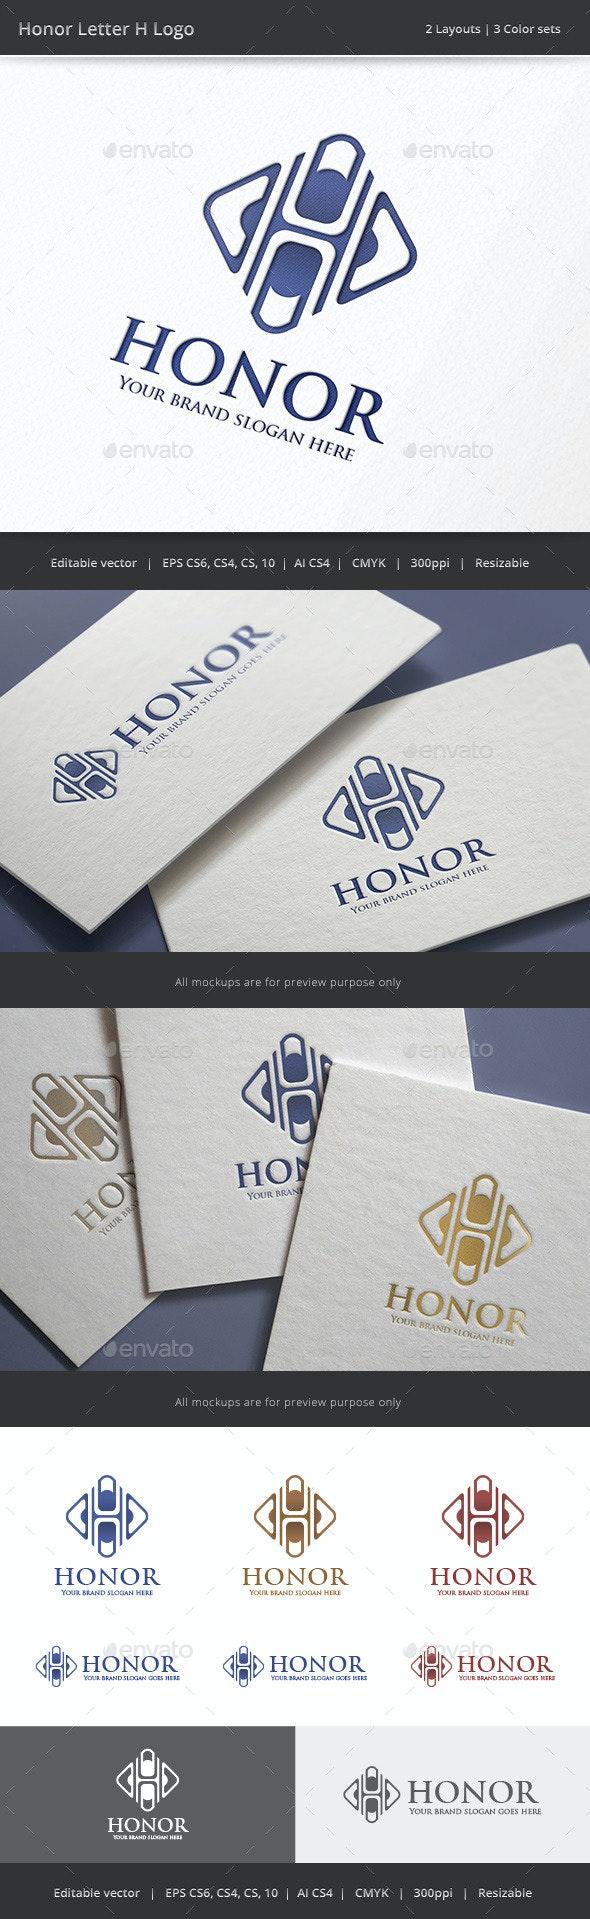 Honor Letter H Logo - Letters Logo Templates